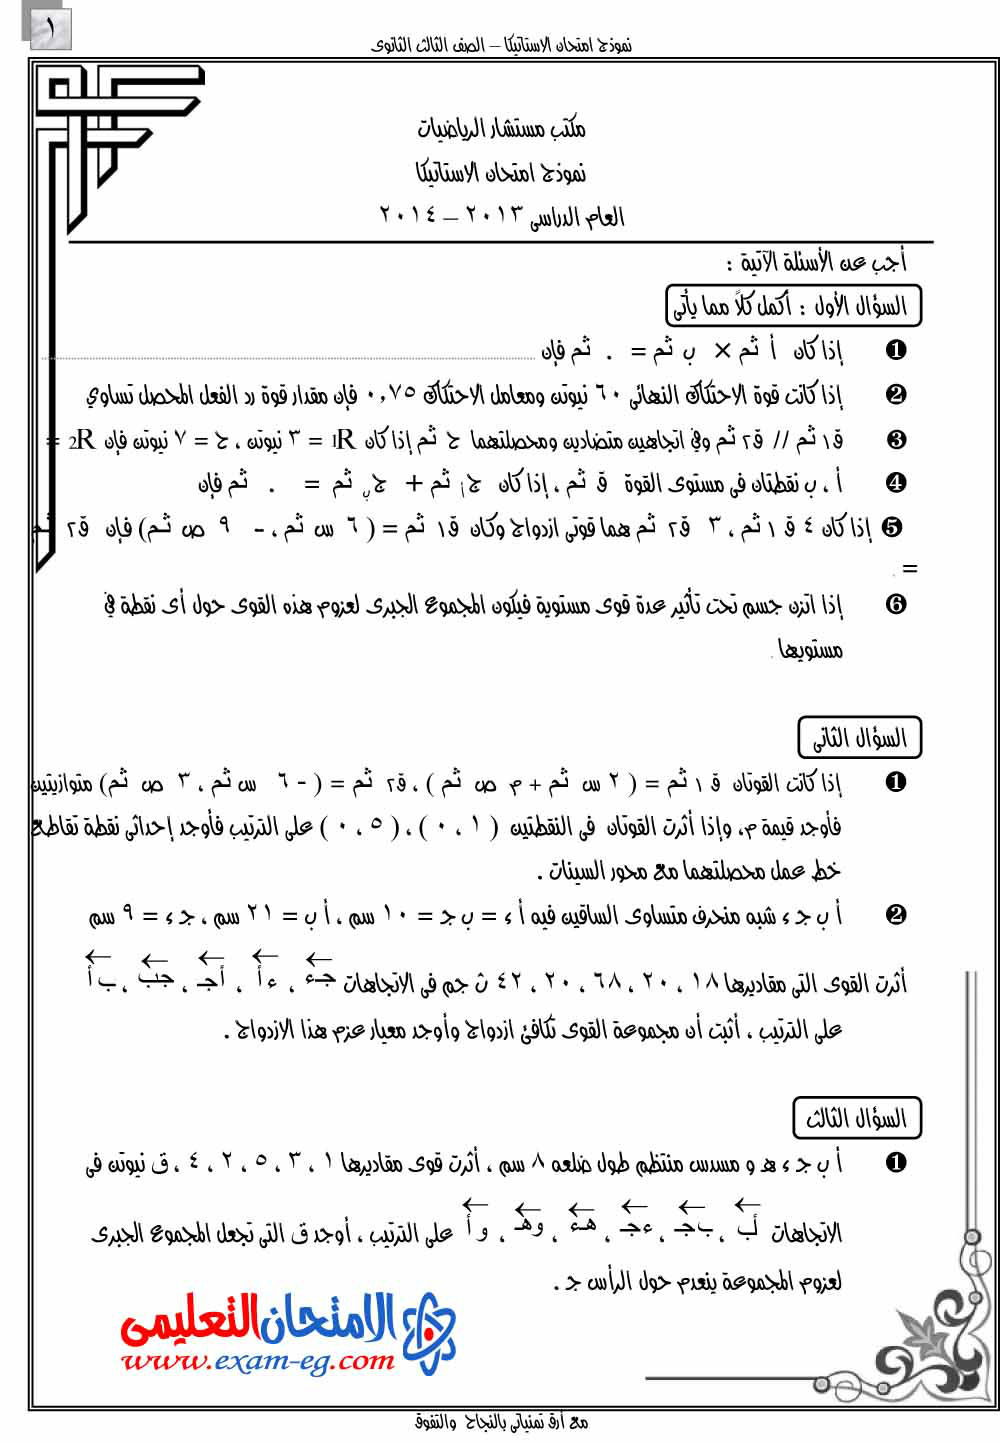 exam-eg.com_1403332834773.jpg